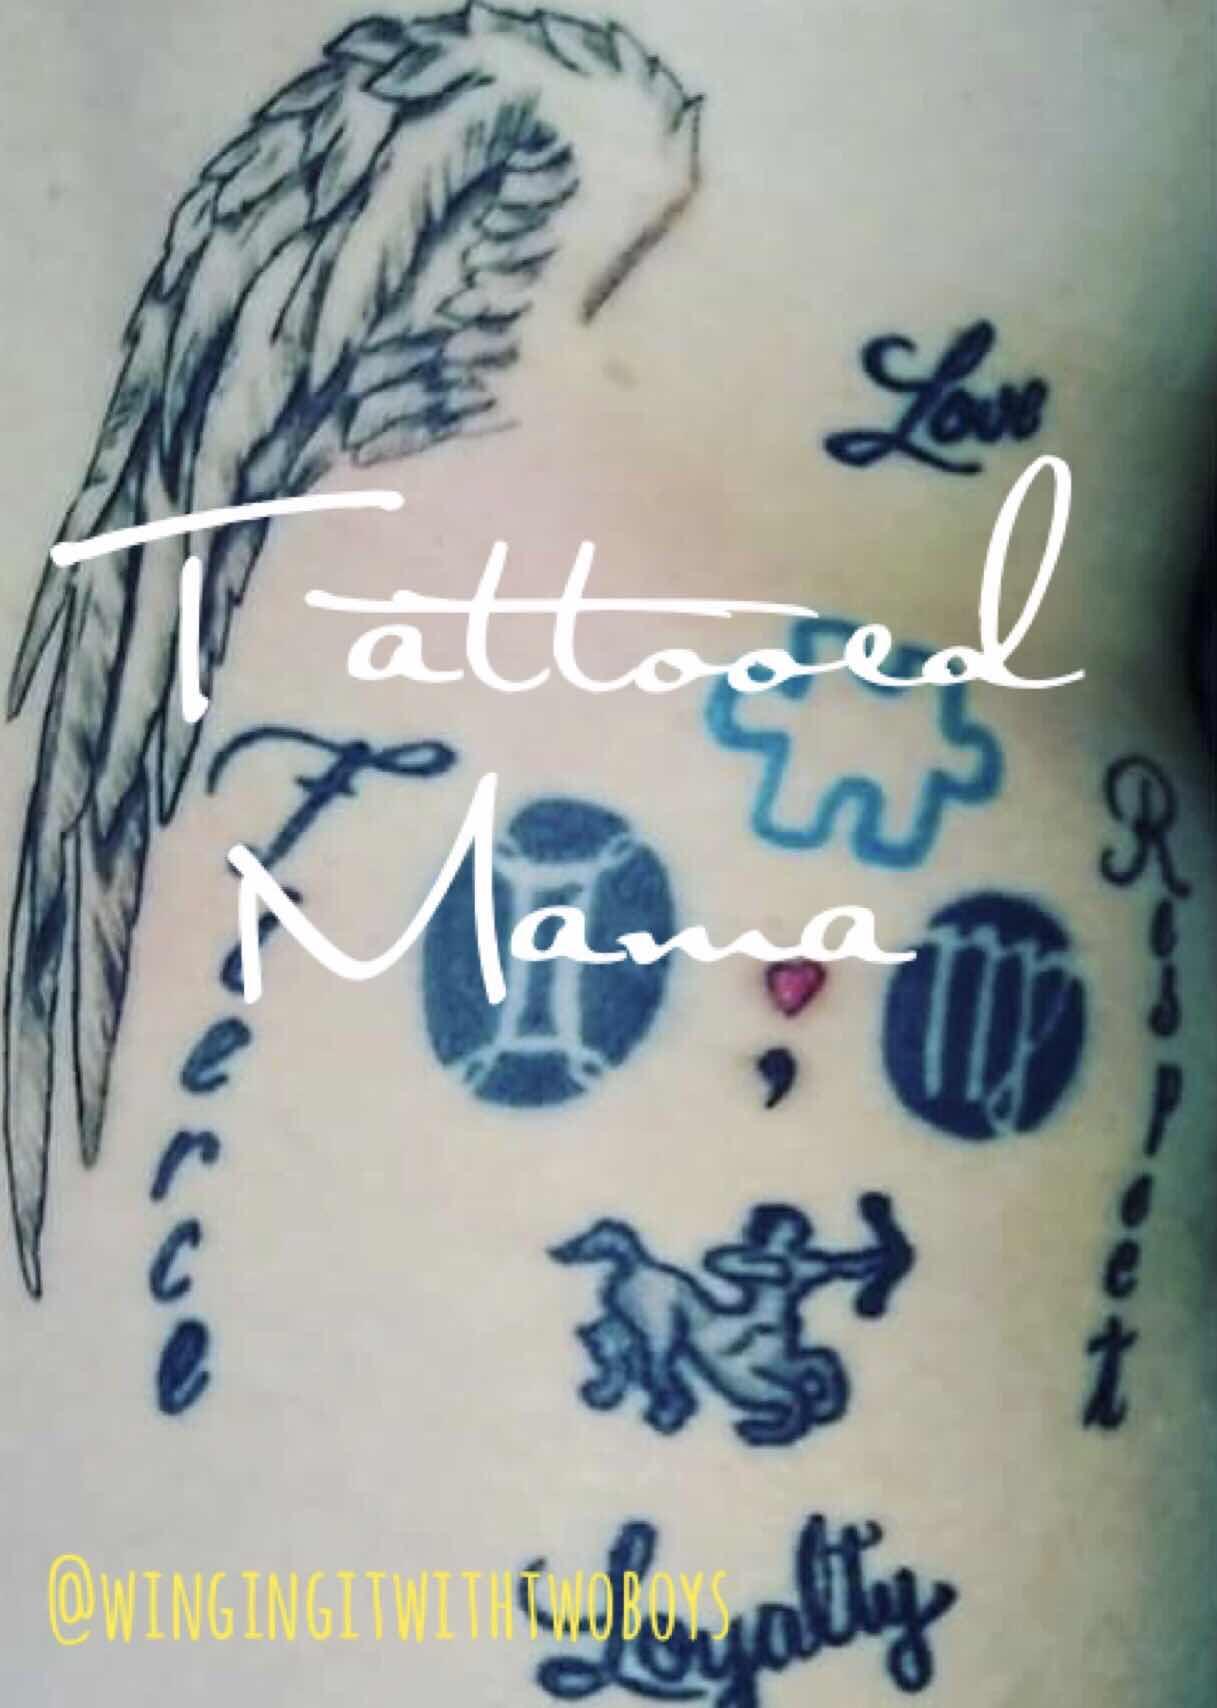 Tattooed Mama - Sarah from DearParents101